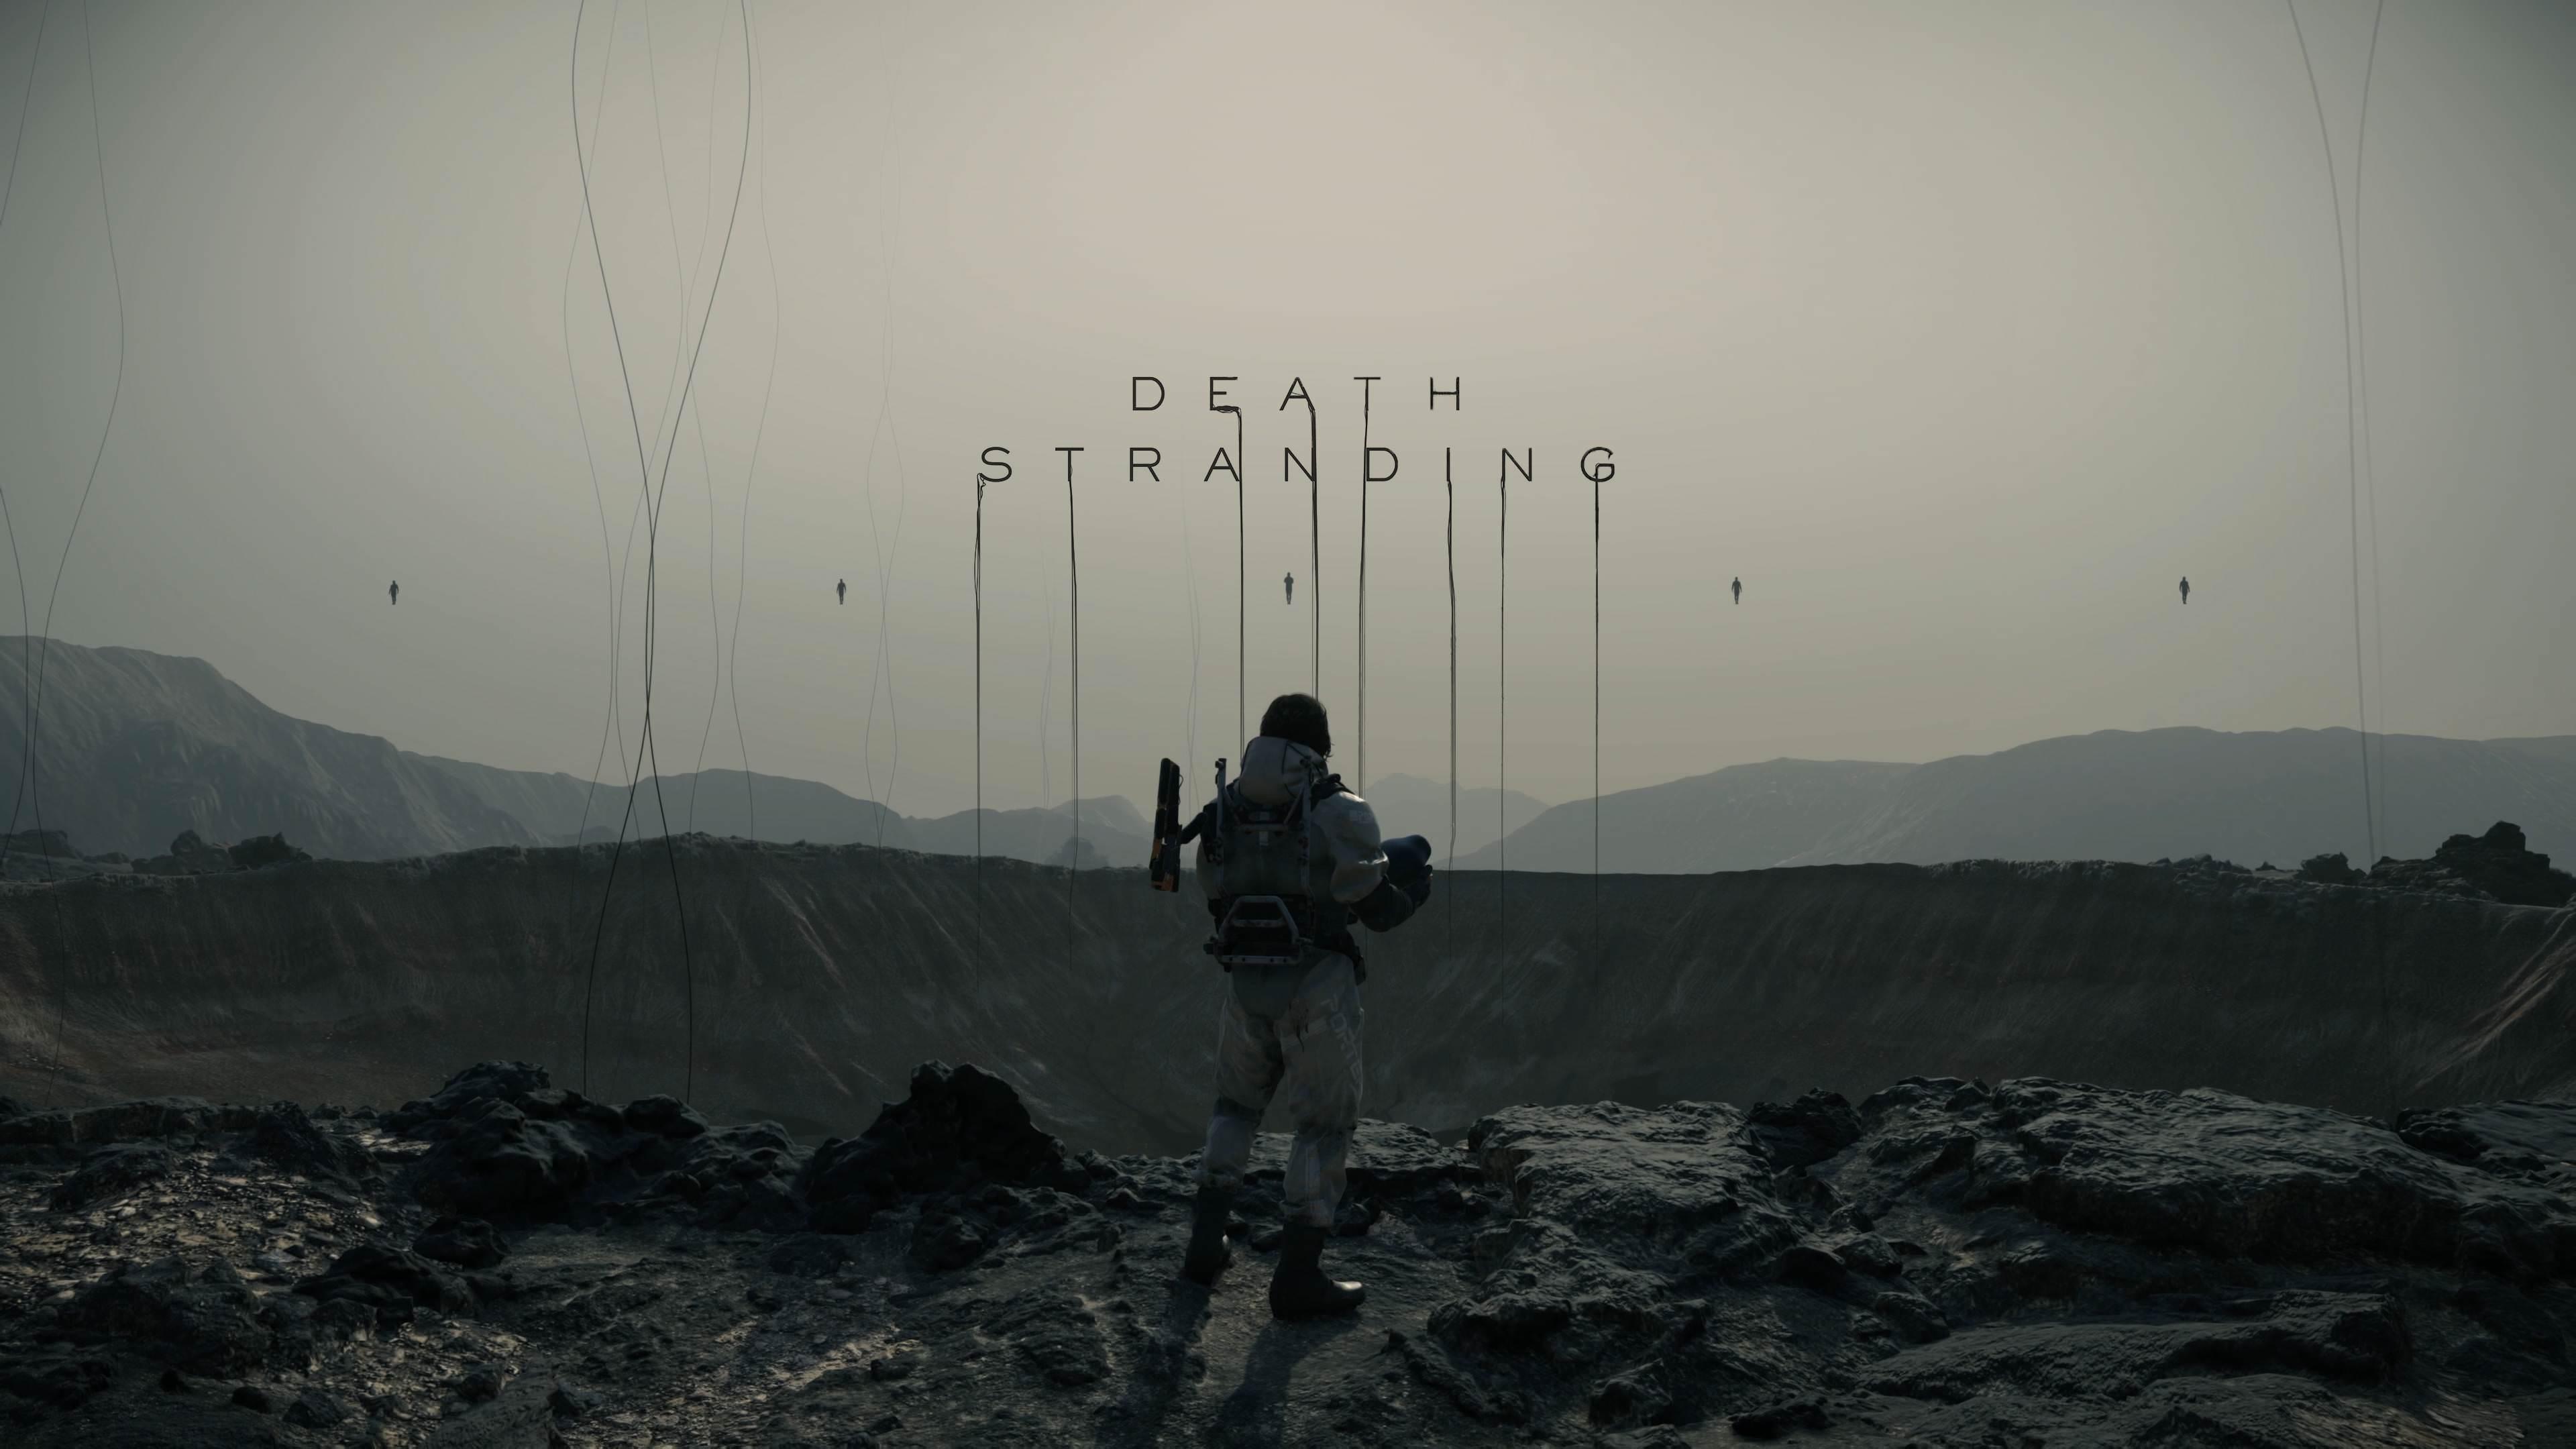 Death Stranding 4k Wallpaper 9